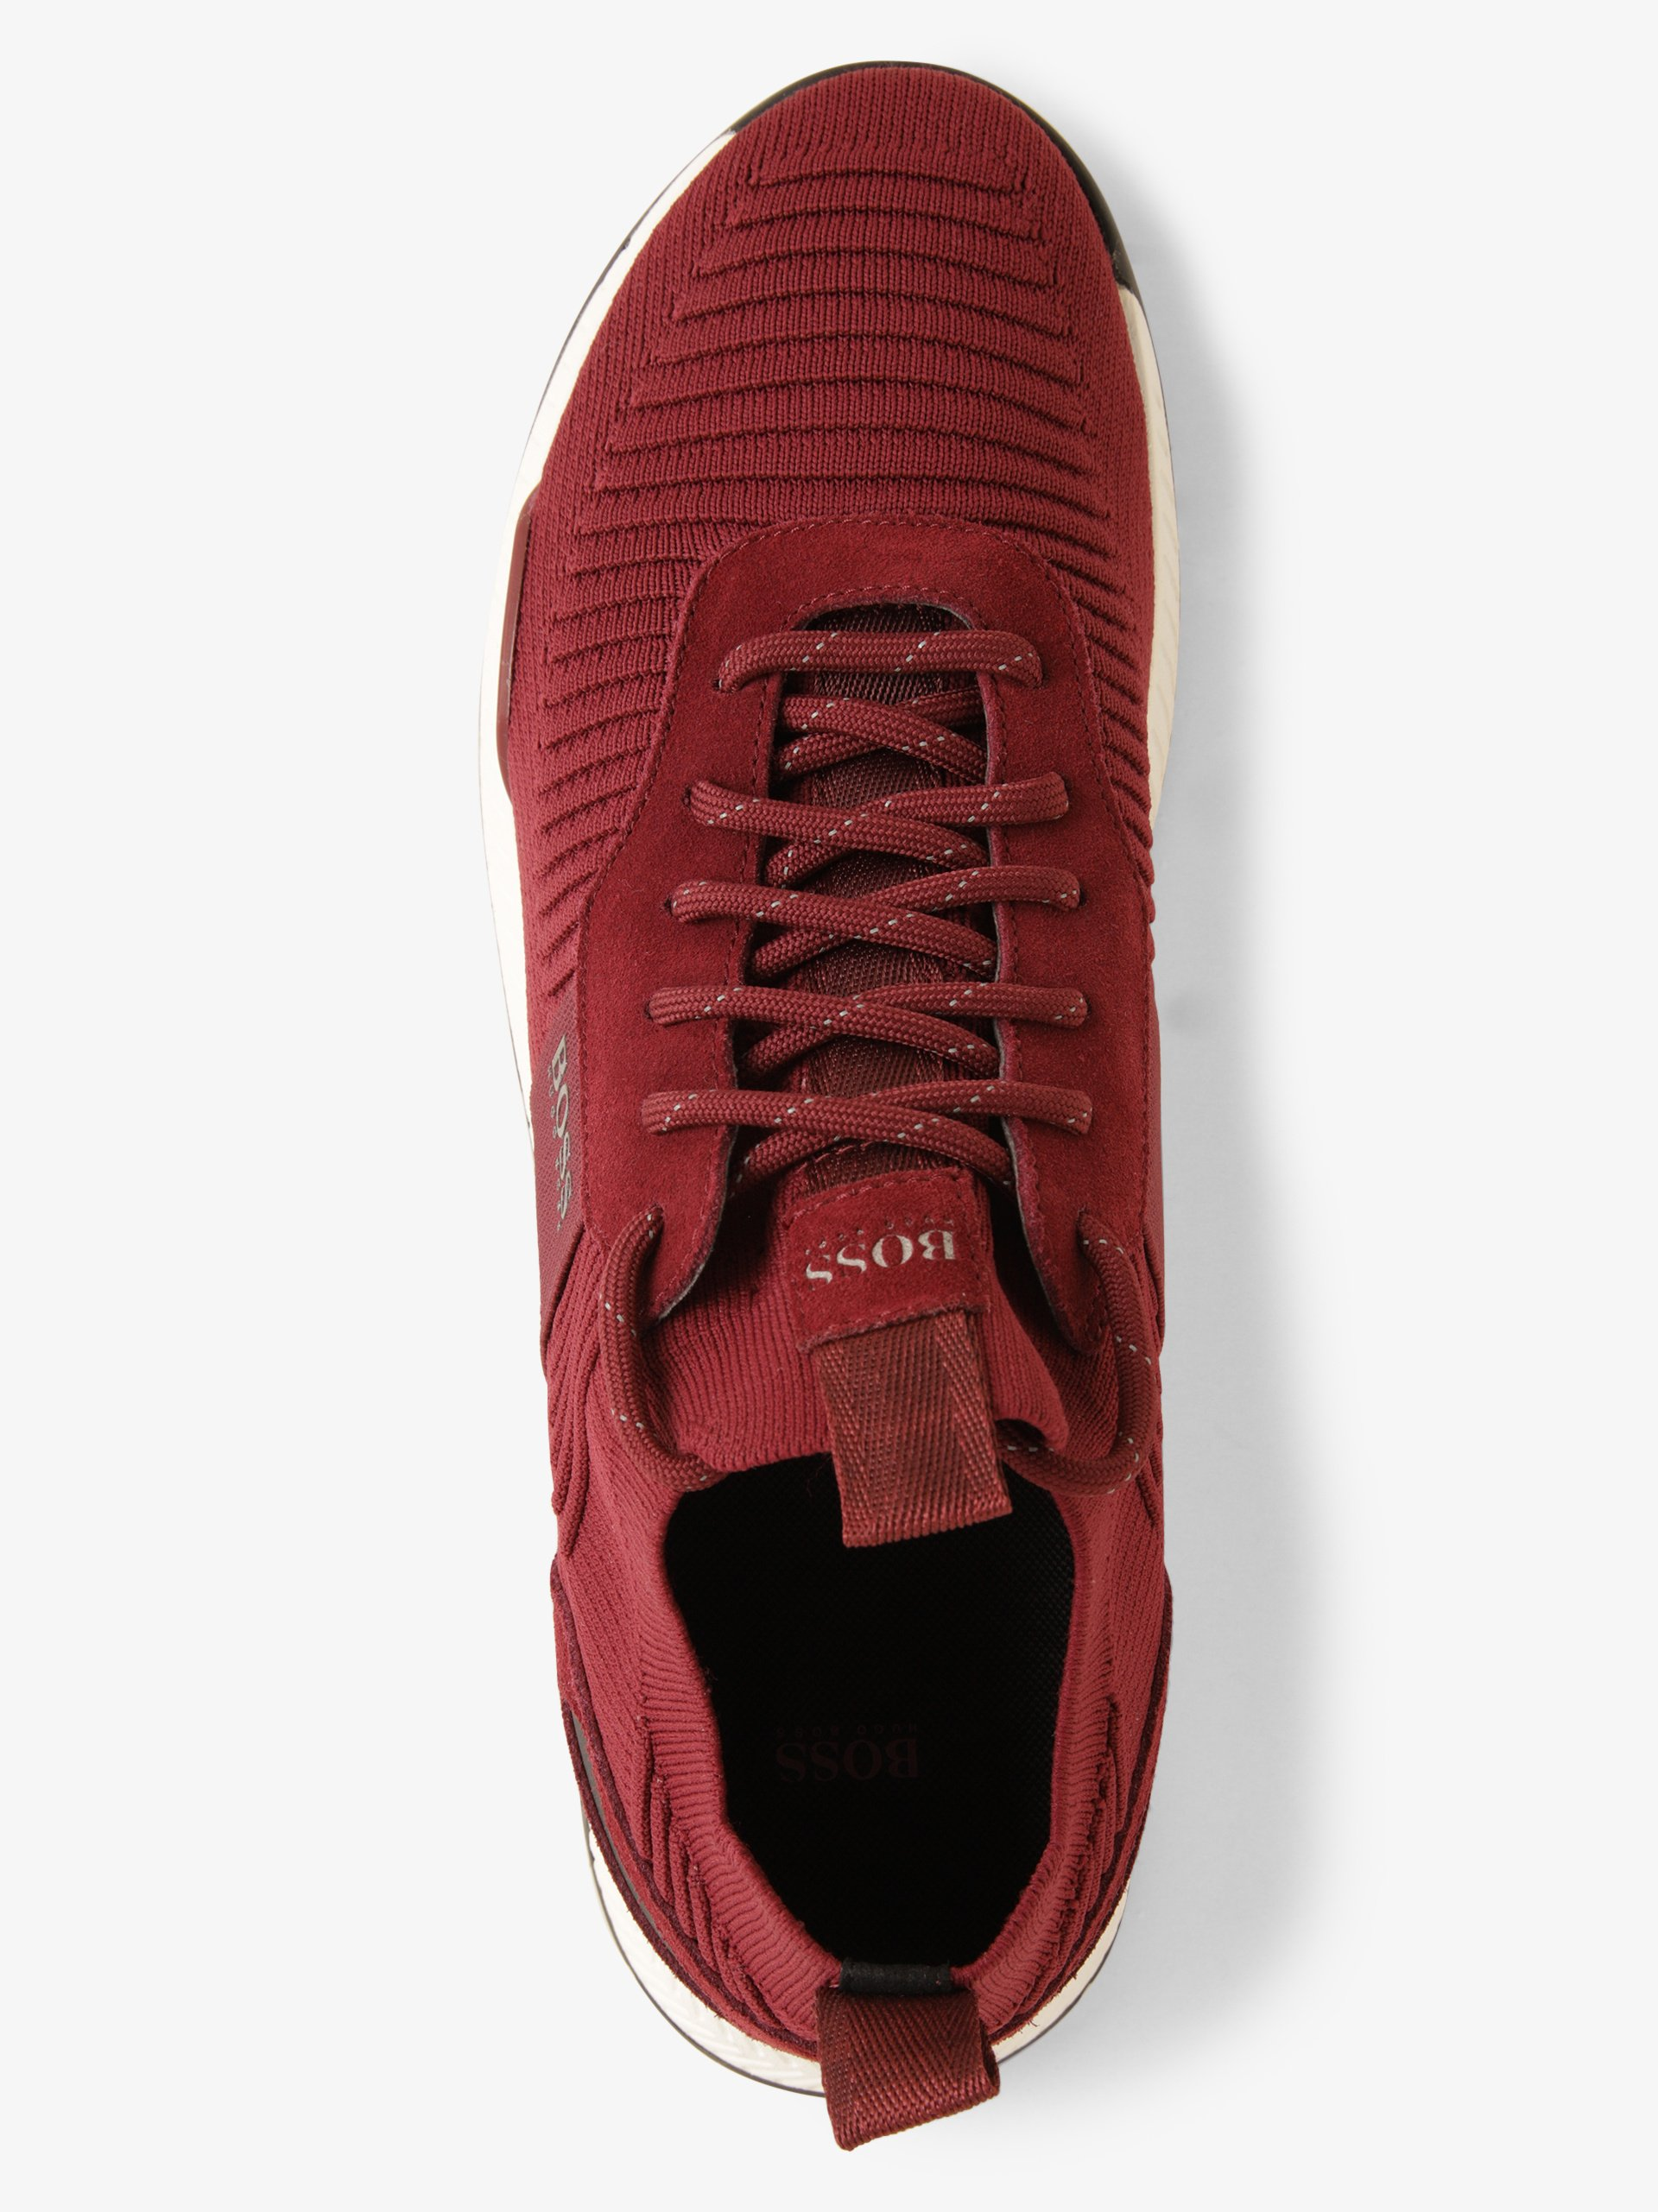 BOSS Athleisure Herren Sneaker mit Leder-Anteil - Titanium_Runn_knst